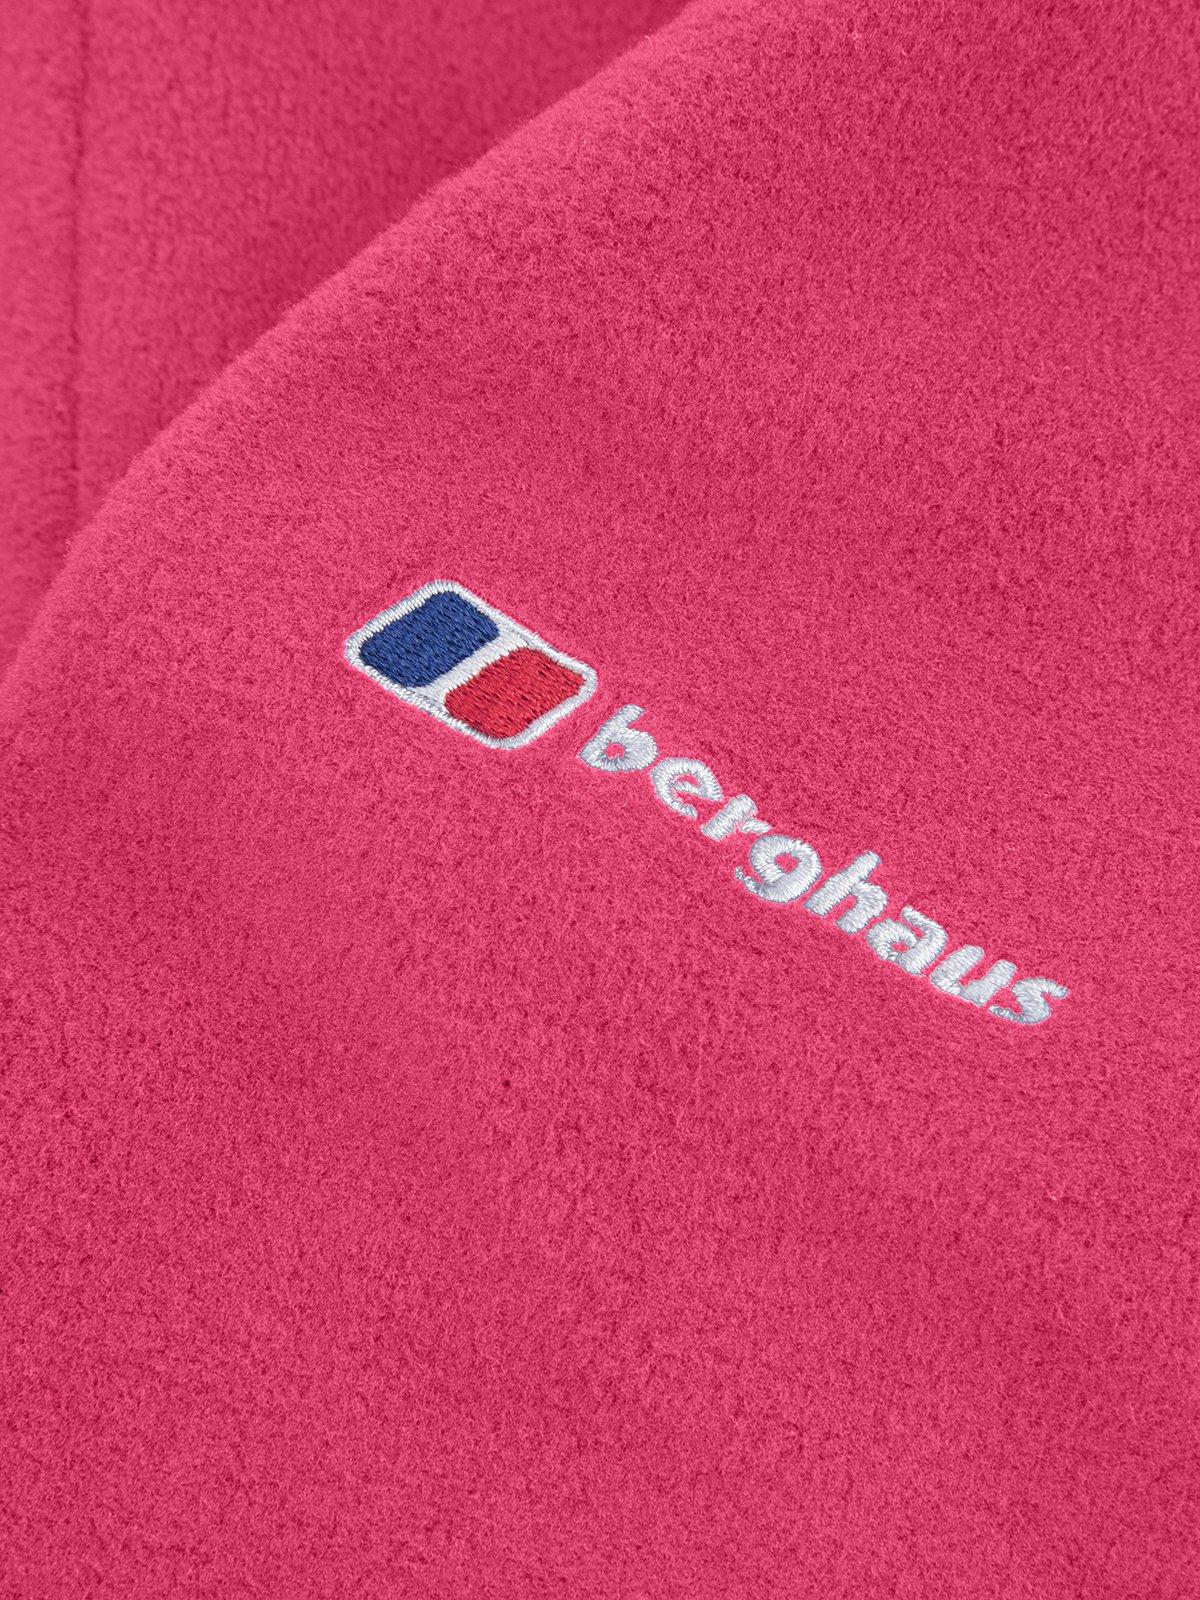 91mI5DpPdXL - Berghaus Prism 2.0 Women's Fleece Jacket